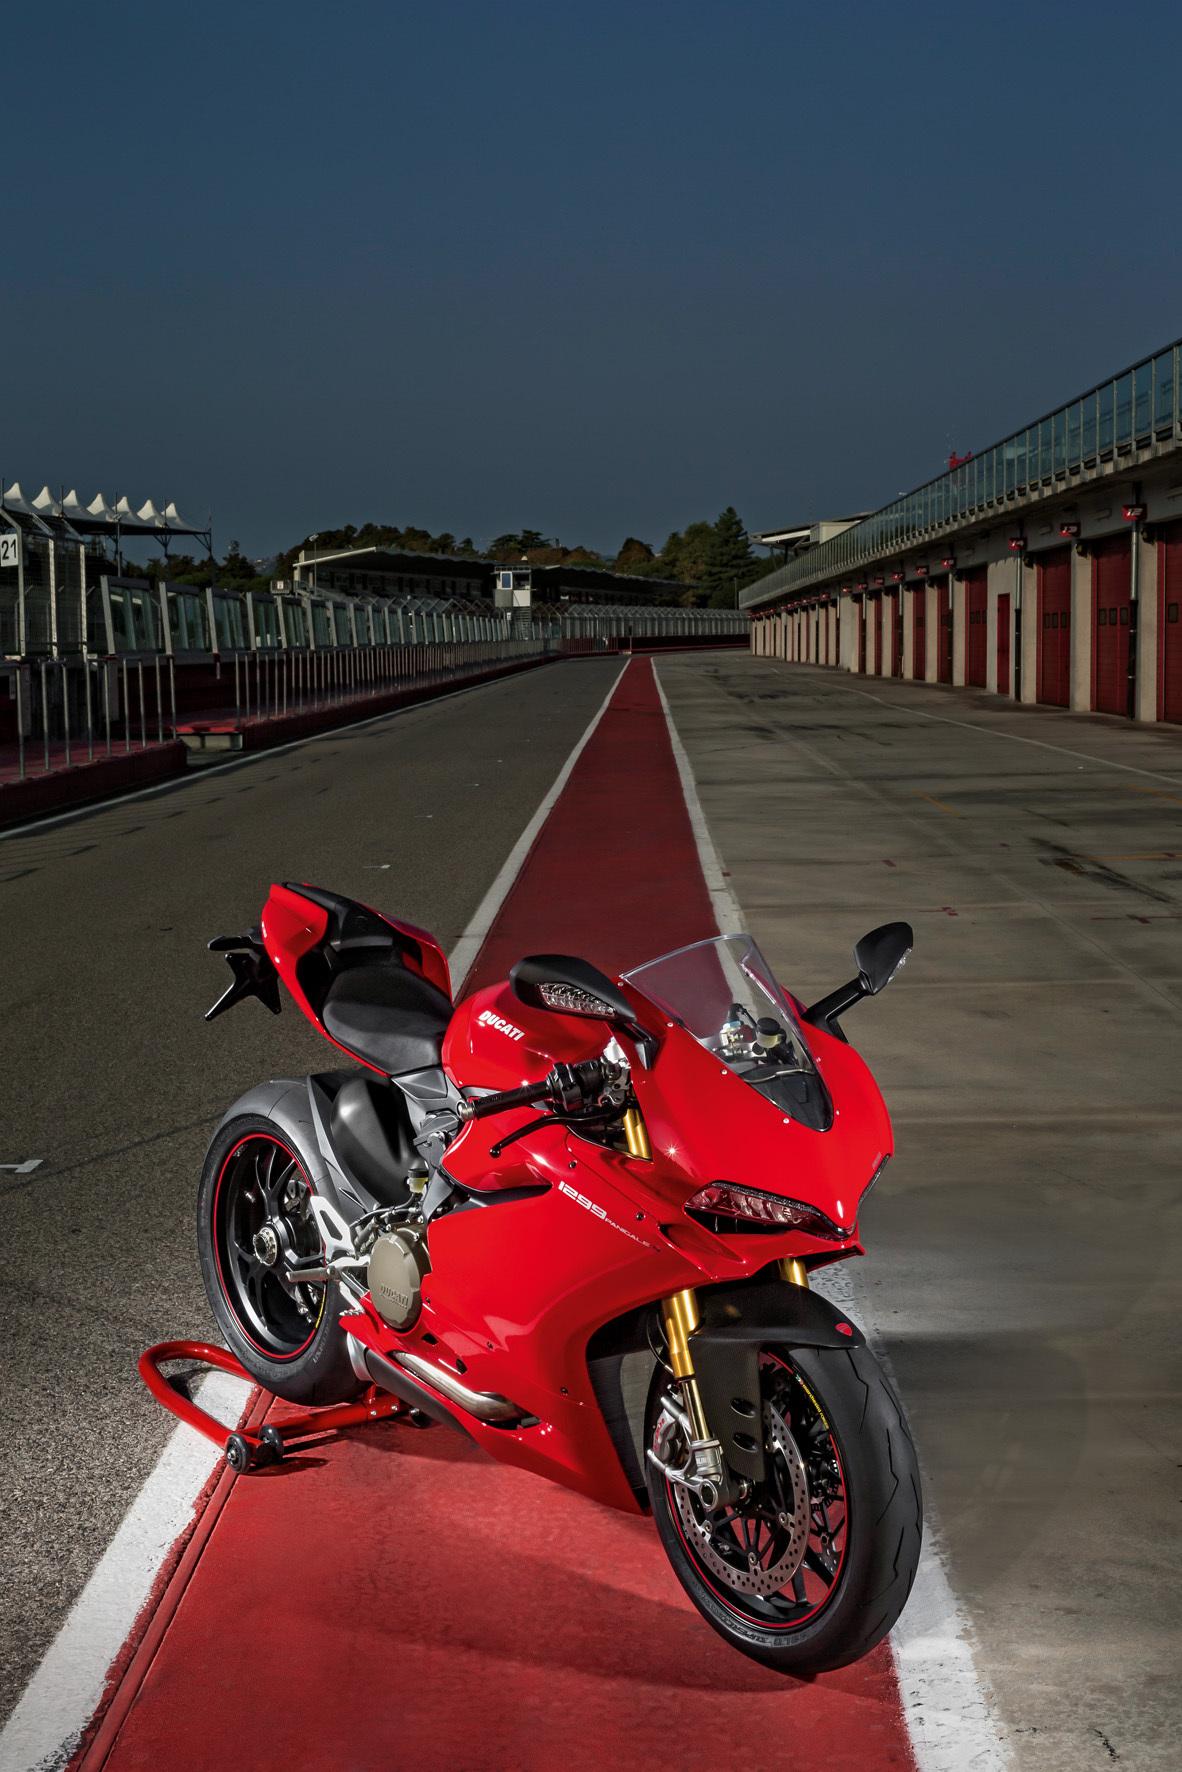 2015 Ducati Panigale 1299 S